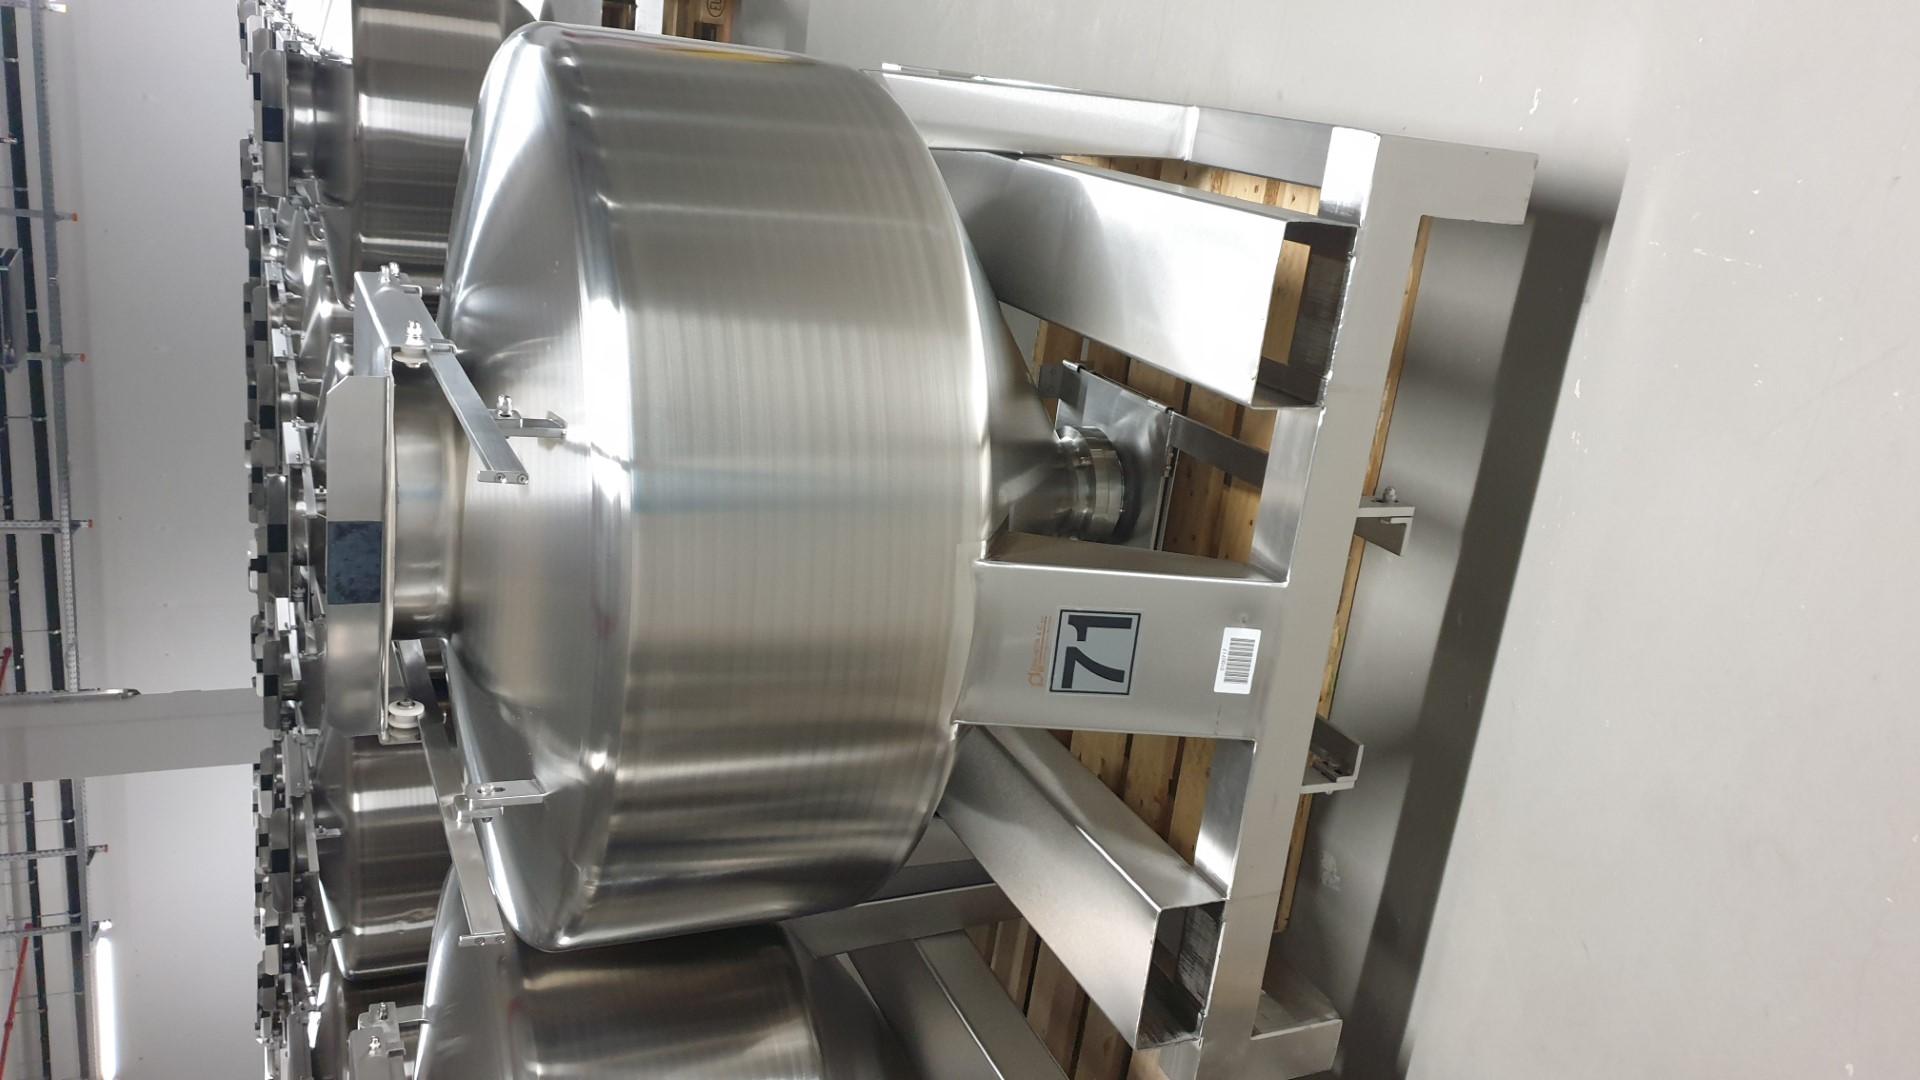 500 Liter / 0.5 Cu Meter Zanchetta Bin, 304 S/S